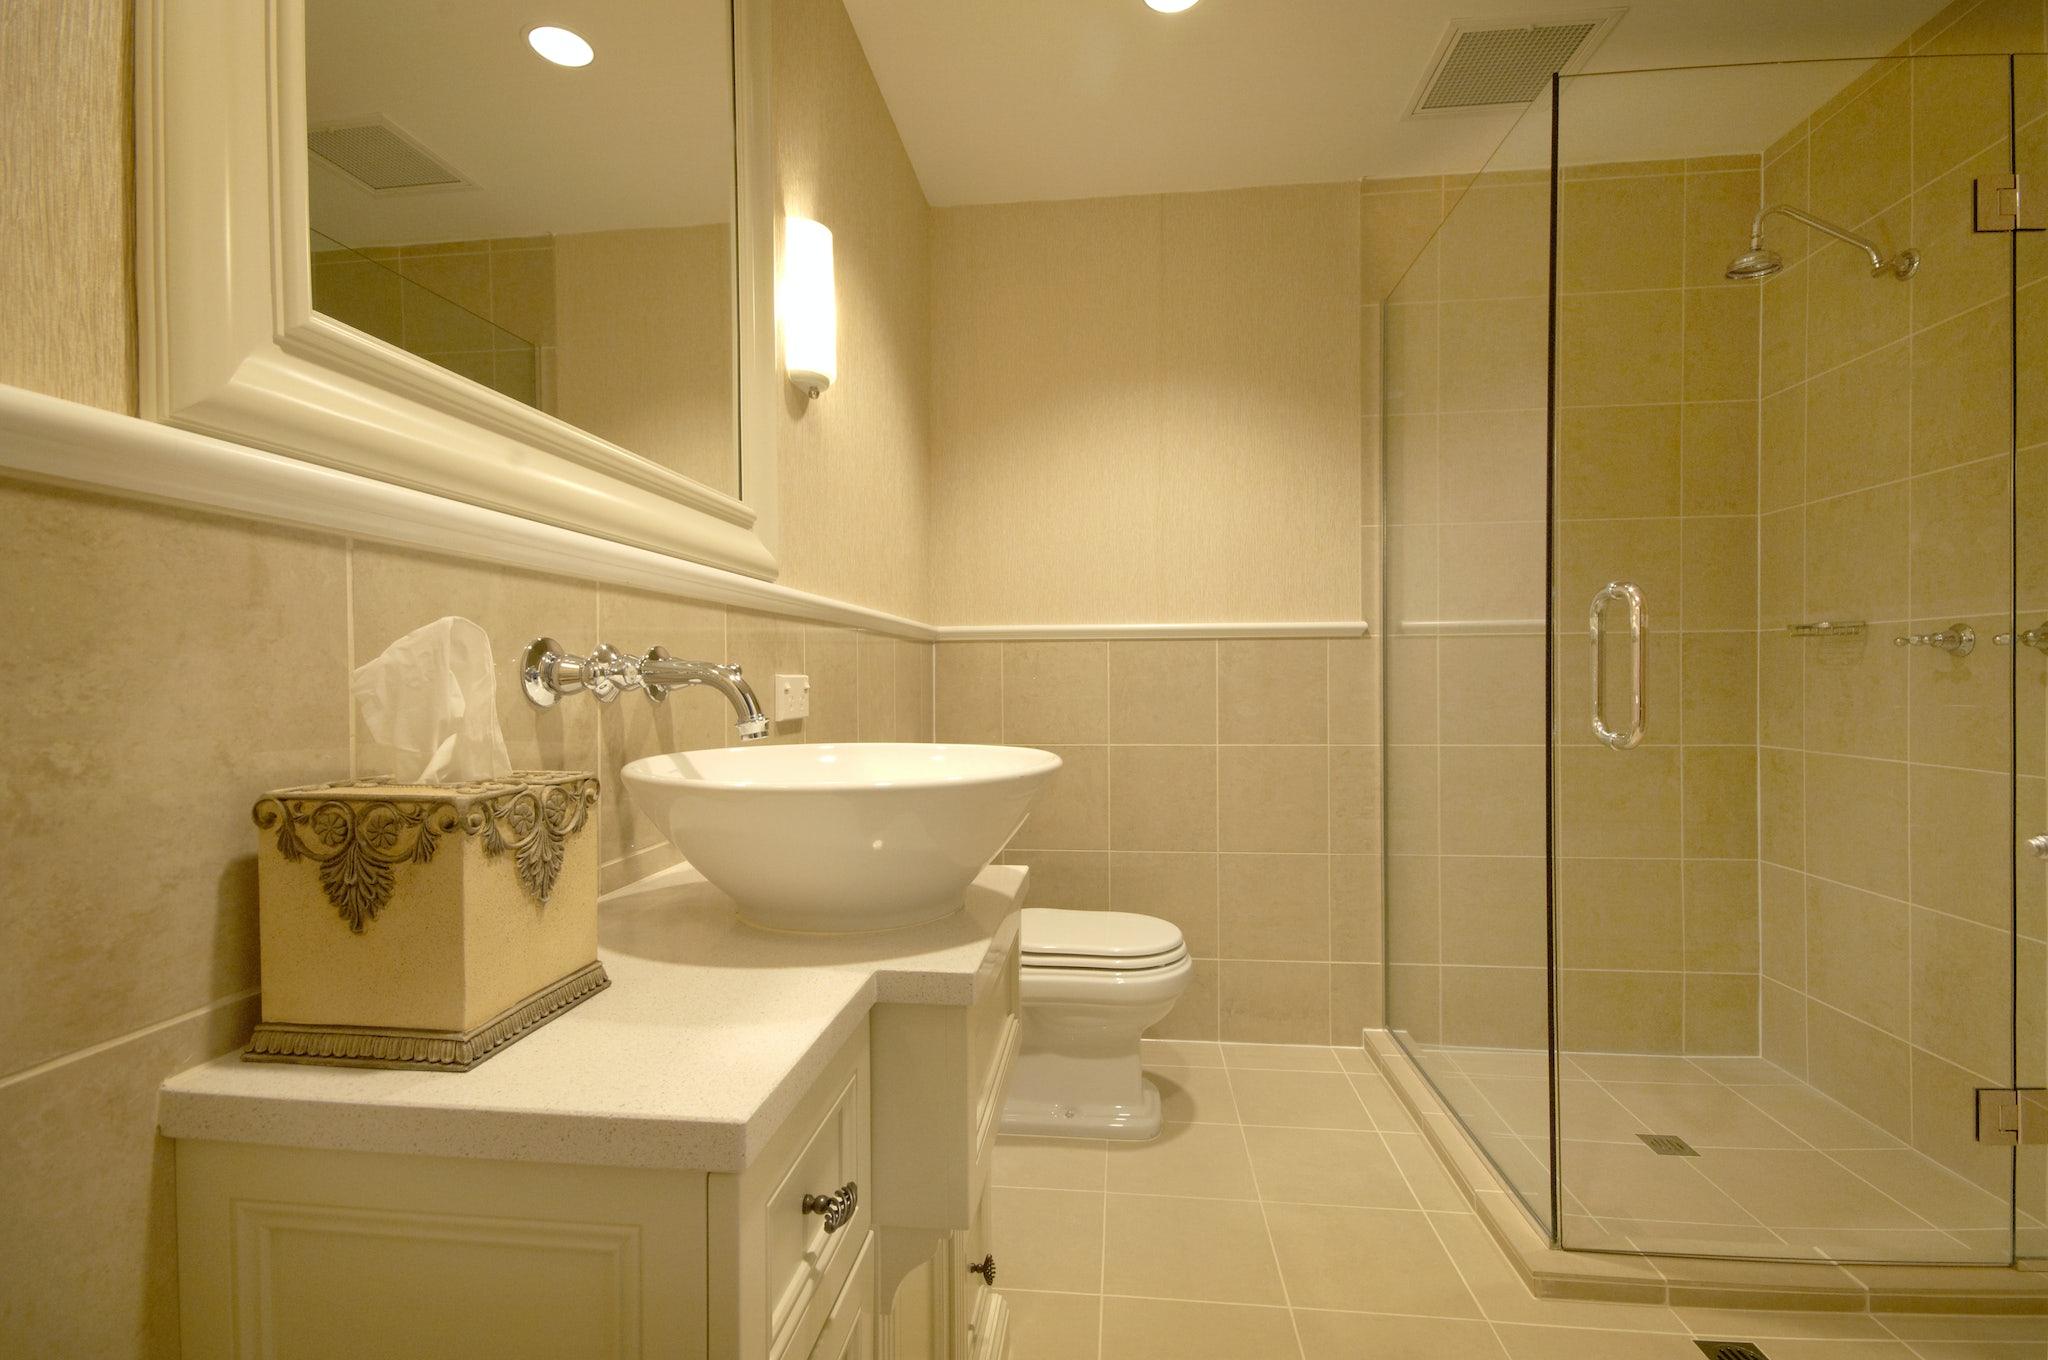 Esplanade apartments queenstown escape with friends for Bathroom design queenstown